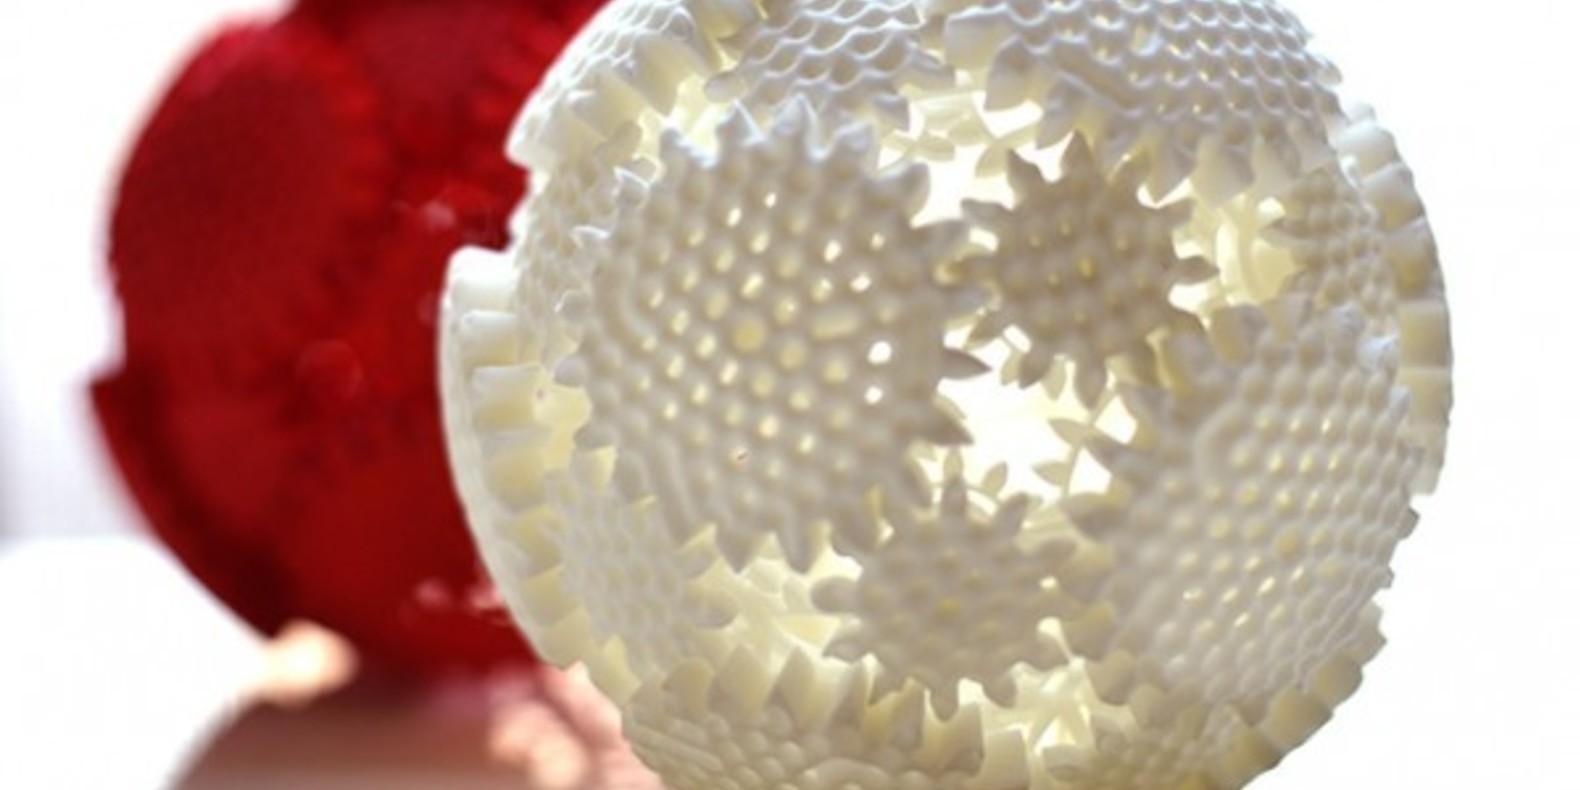 machaneu v1 proxy design studio 3D printing cults 3D impression objet impressionnant 1